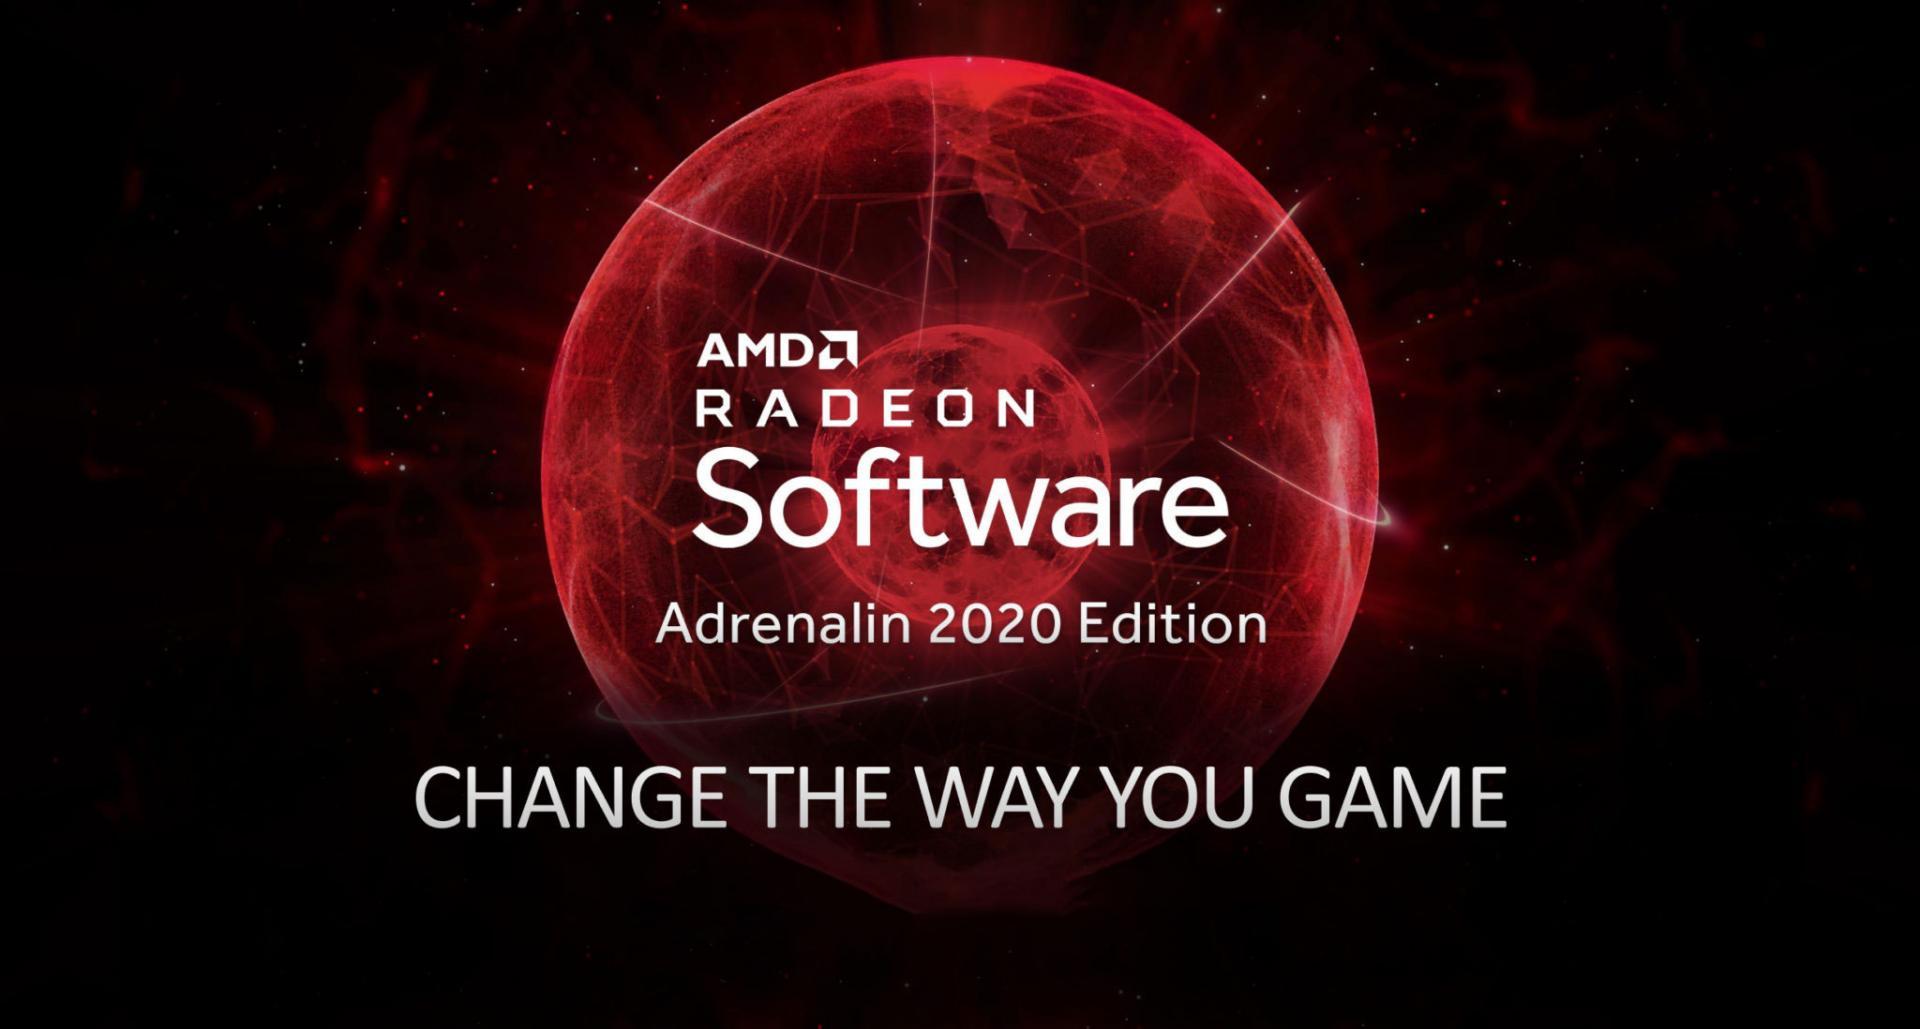 AMD обновила драйвер для видеокарт Radeon — Adrenalin 2020 20.1.3